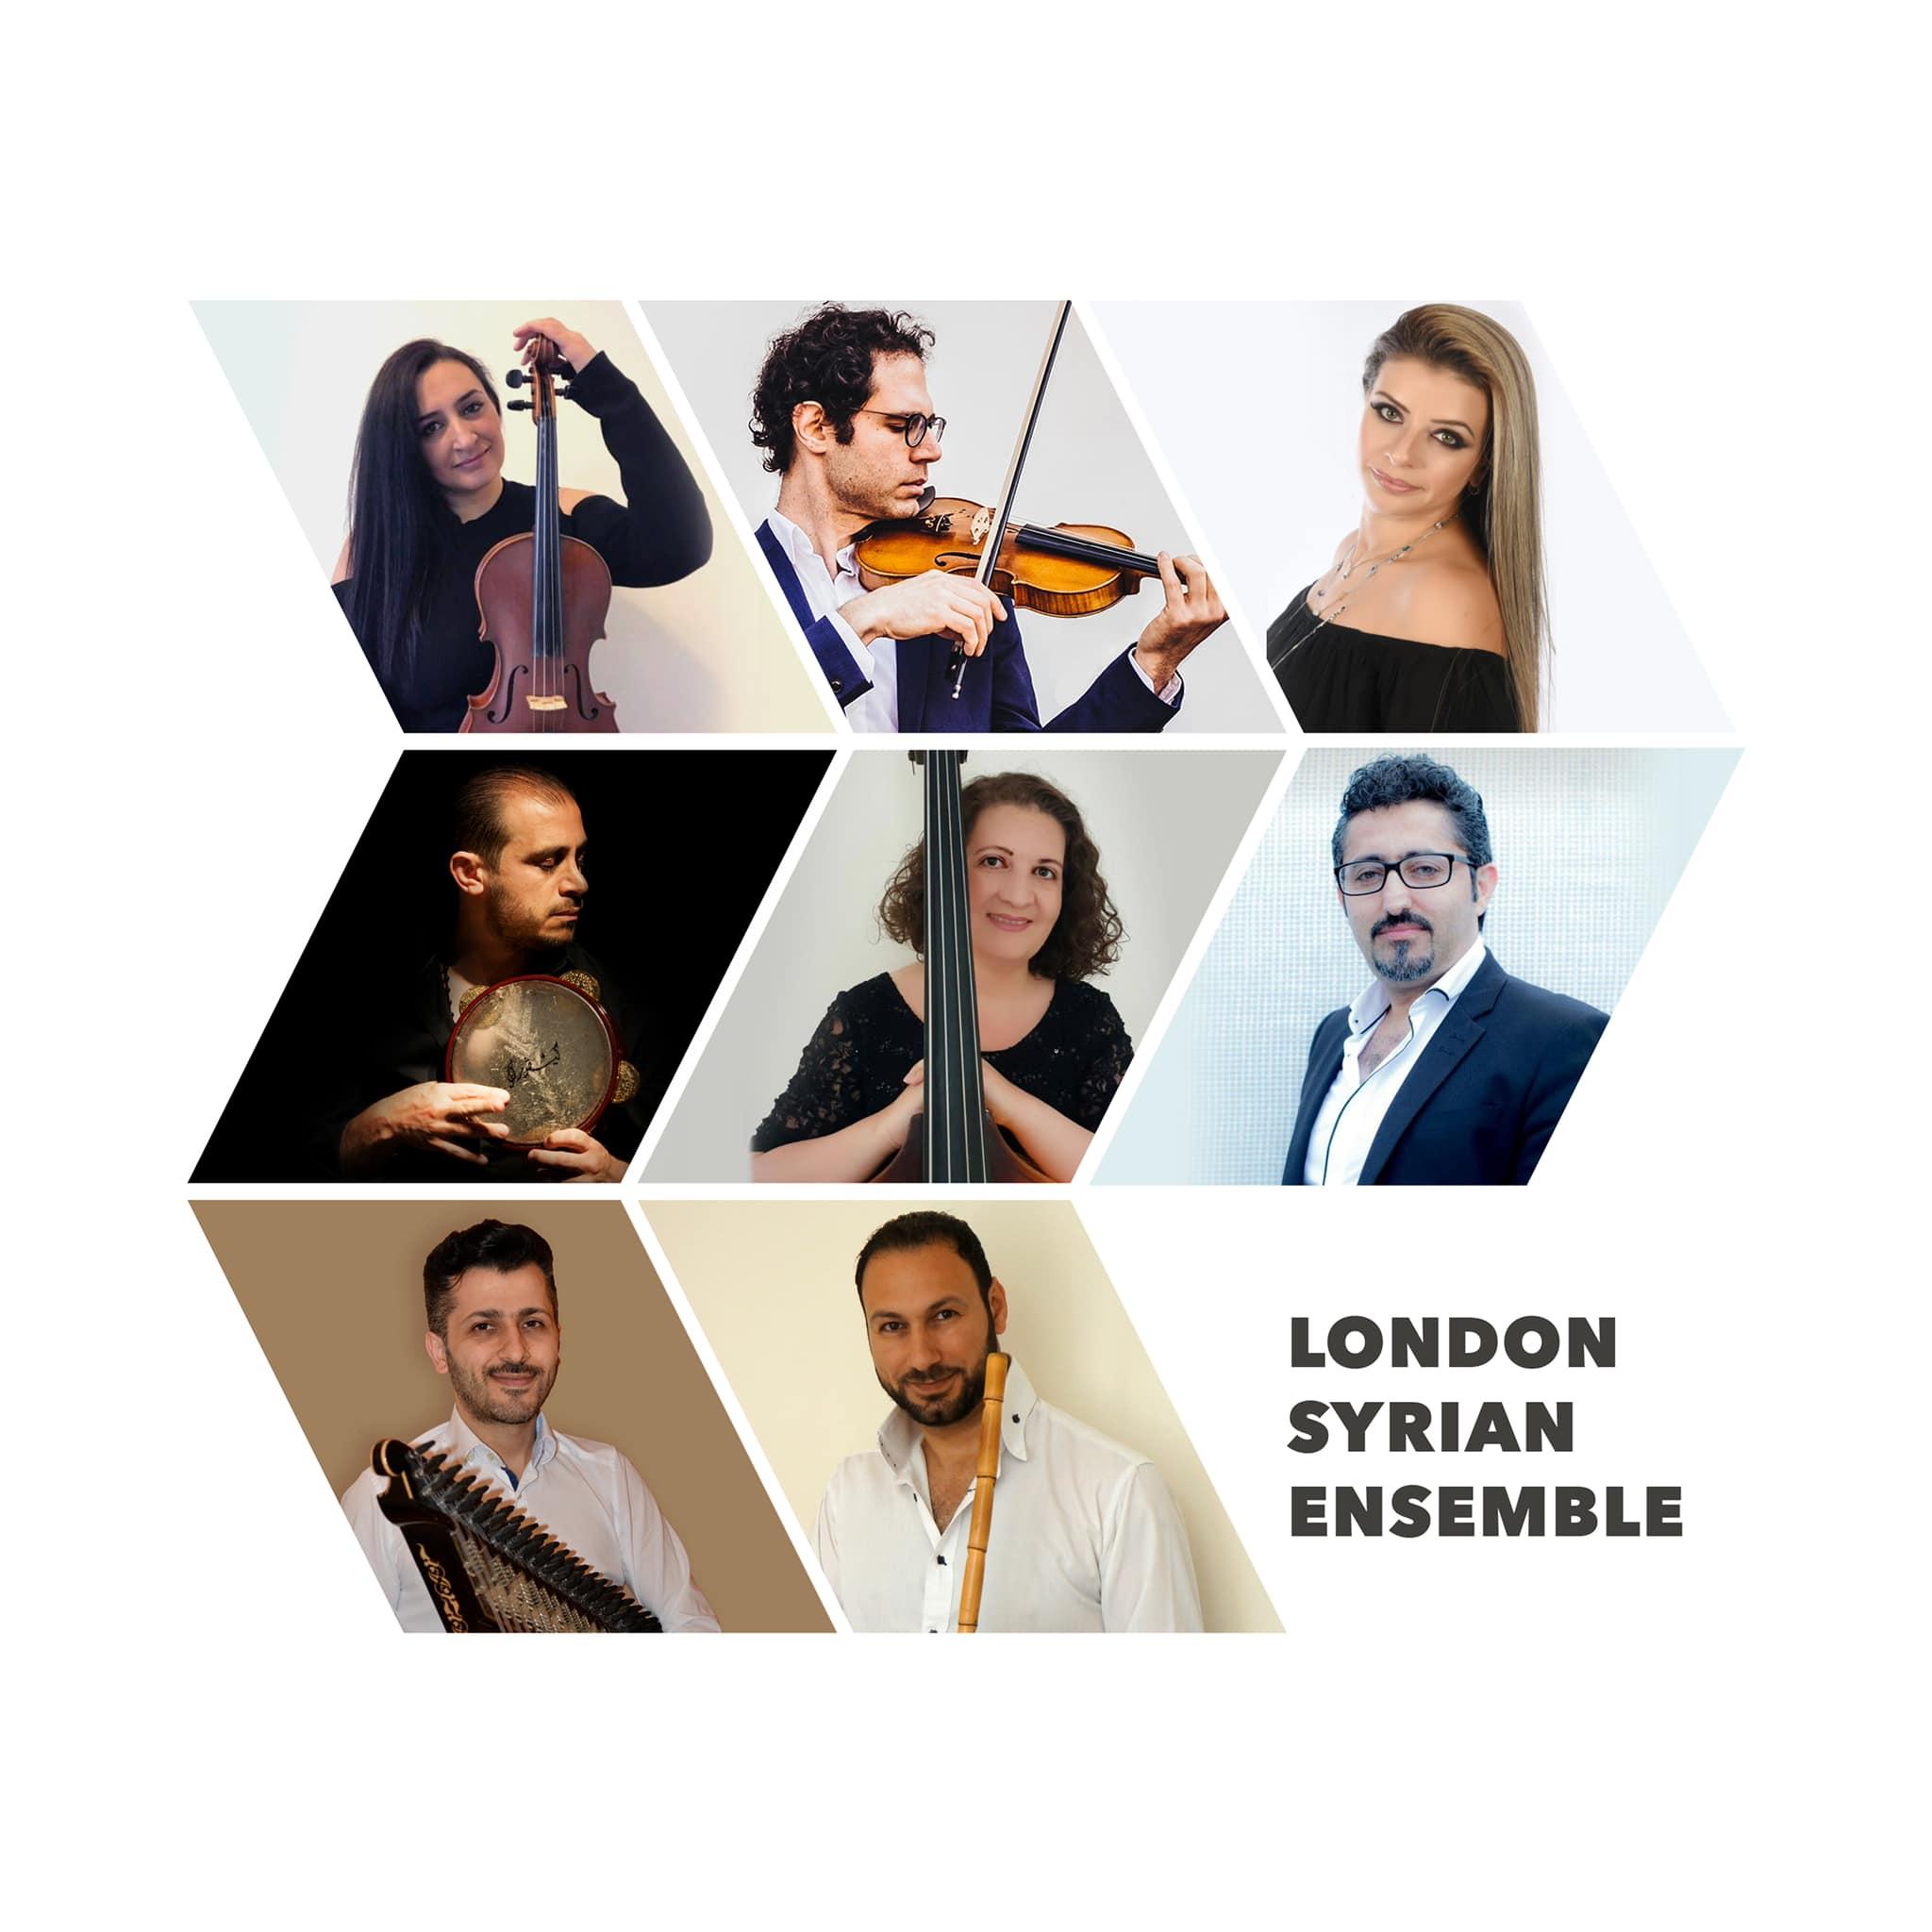 London-Syrian-Ensemable